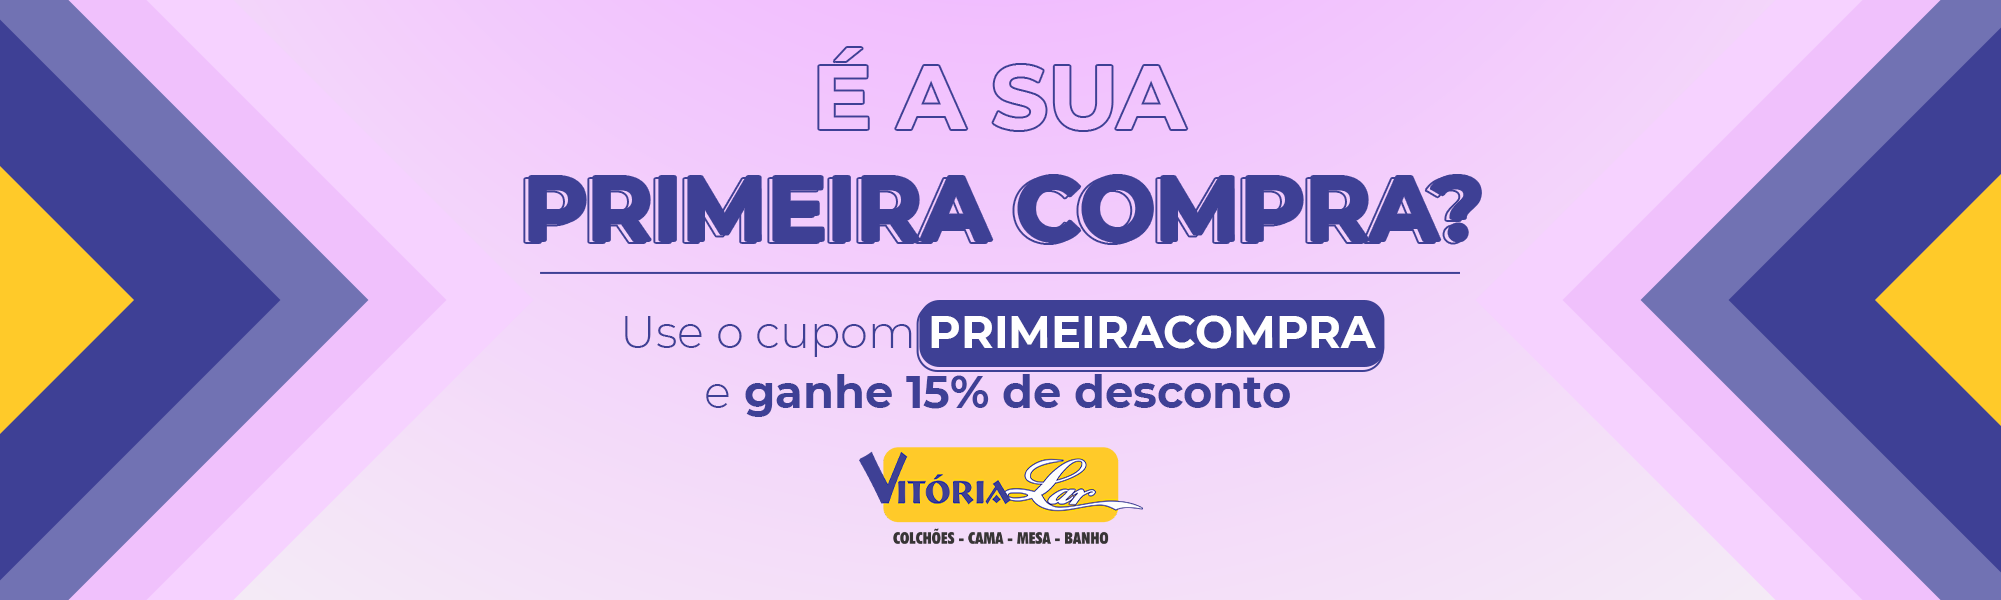 https://www.vitorialar.com.br/cama